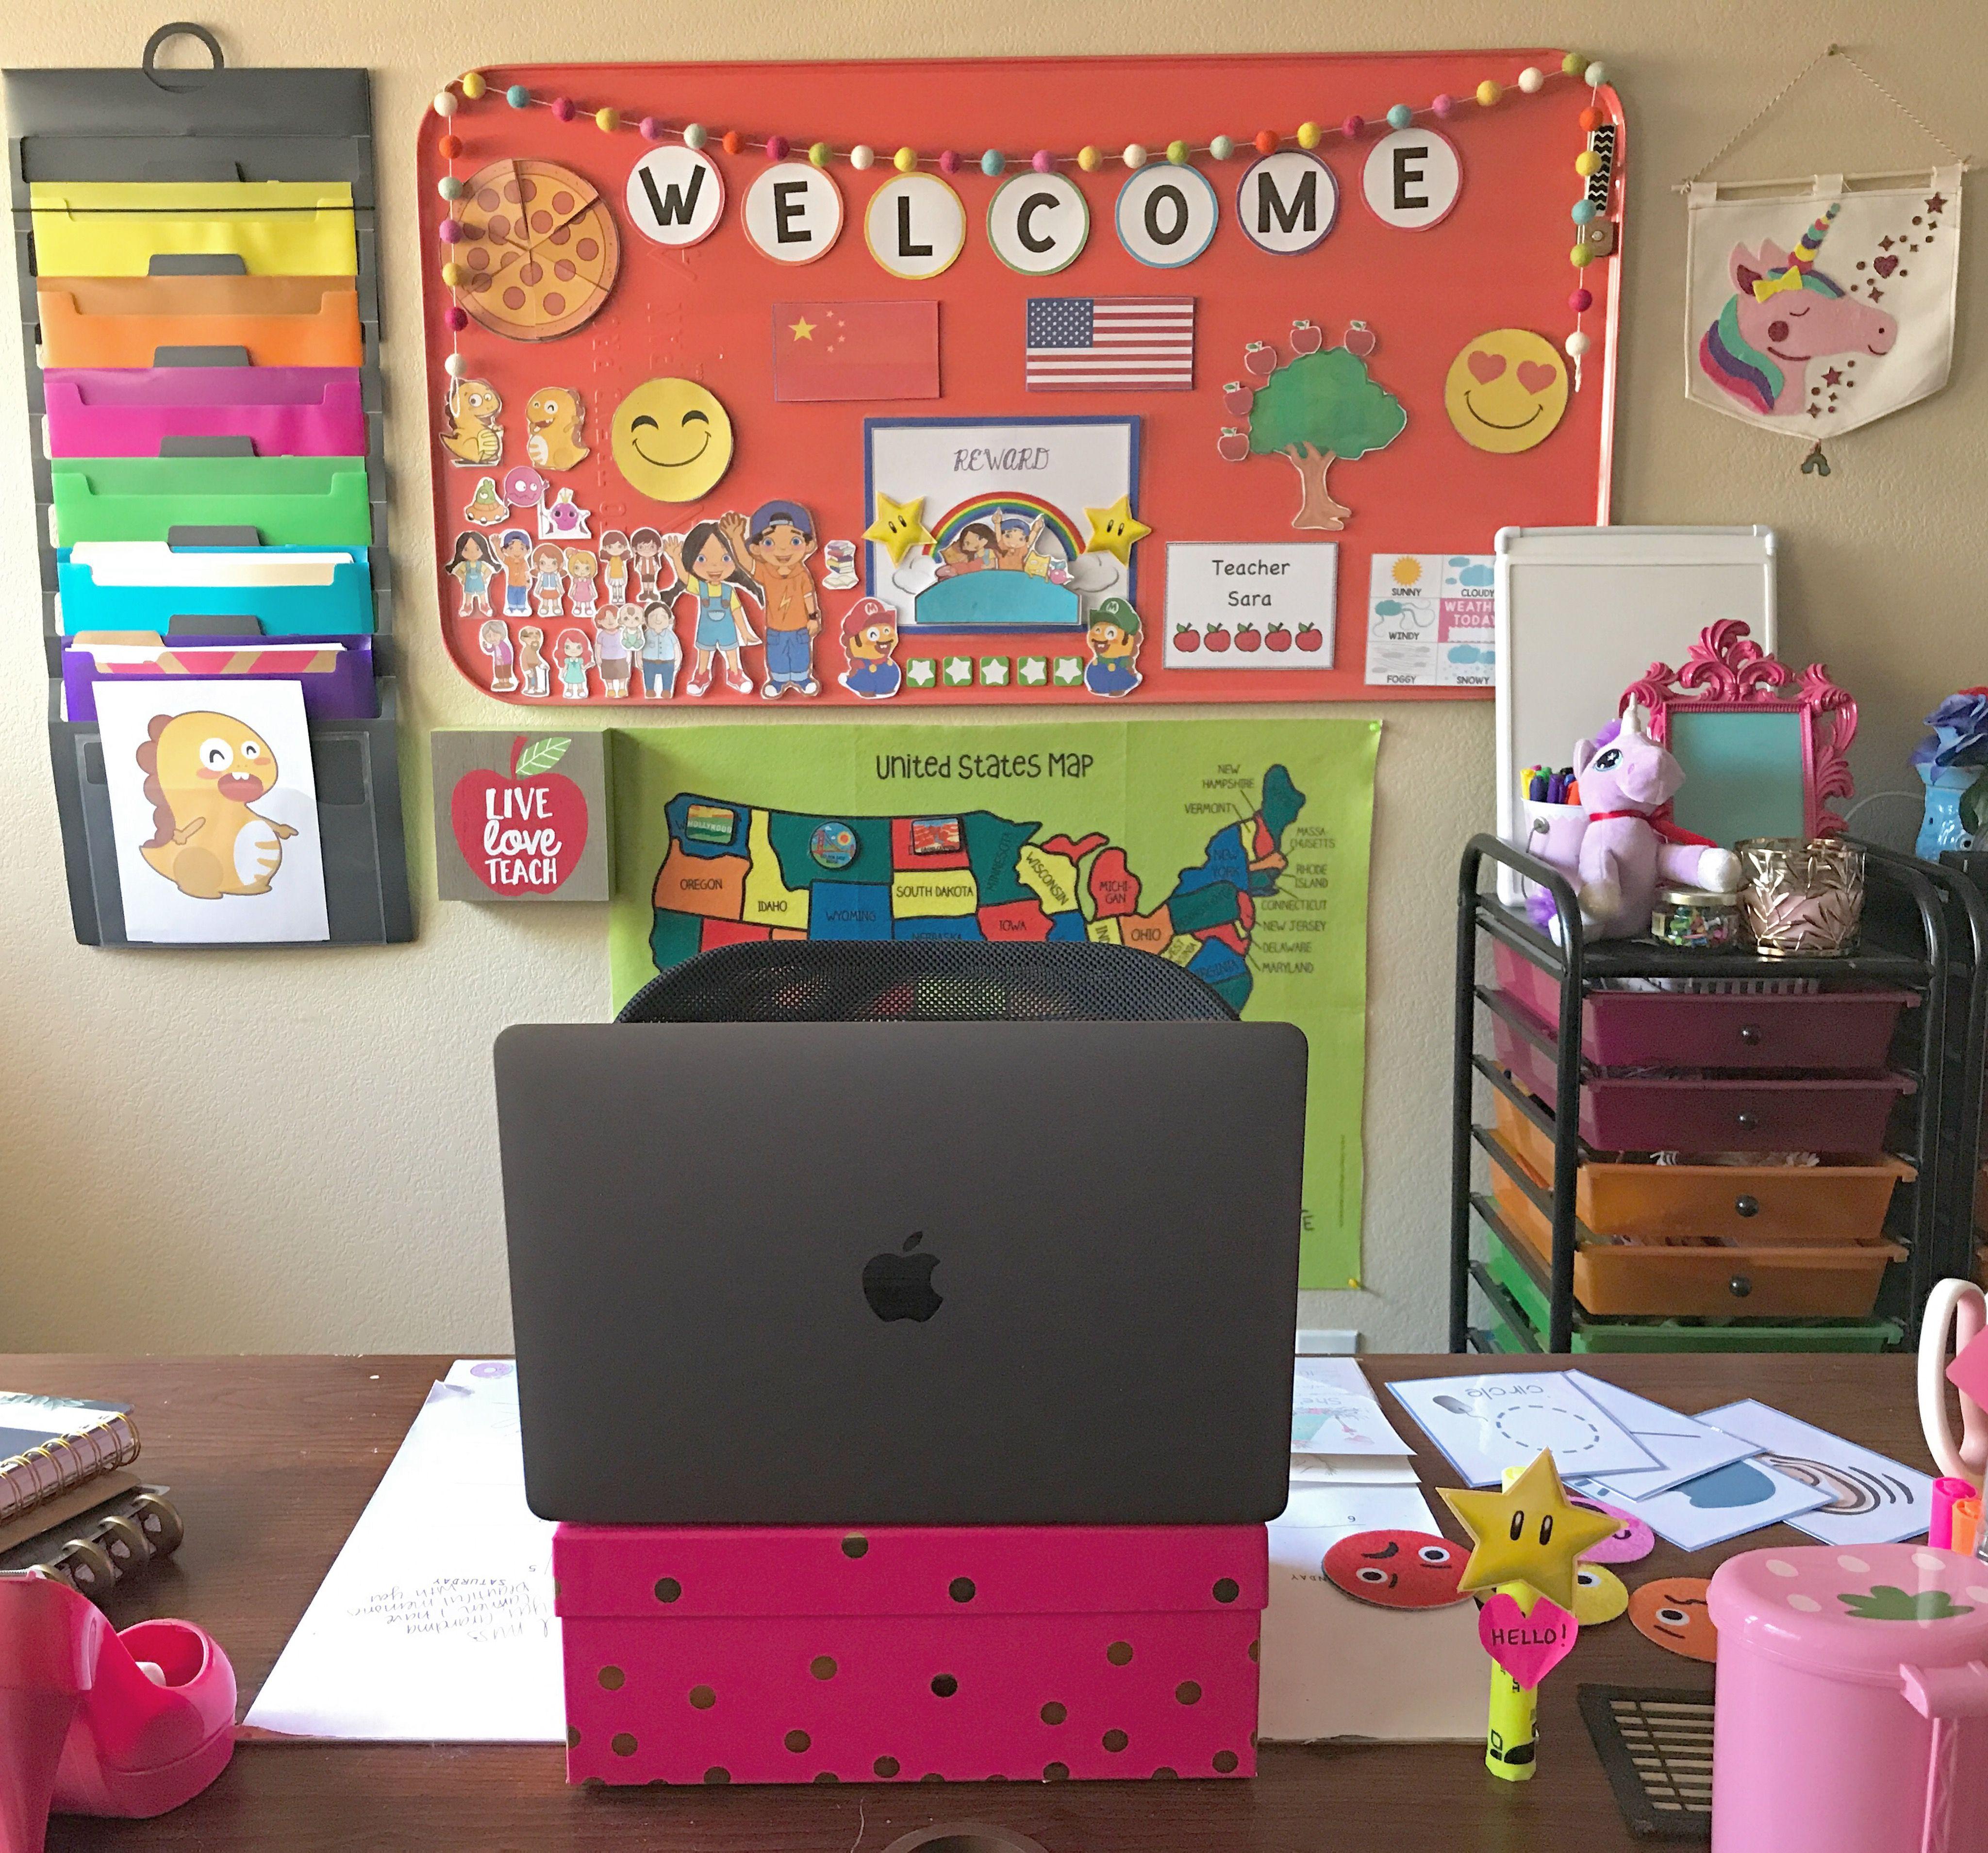 Decorate My Home Online: My VIPKid Classroom #vipkid #vipkidclassroom #workfromhome